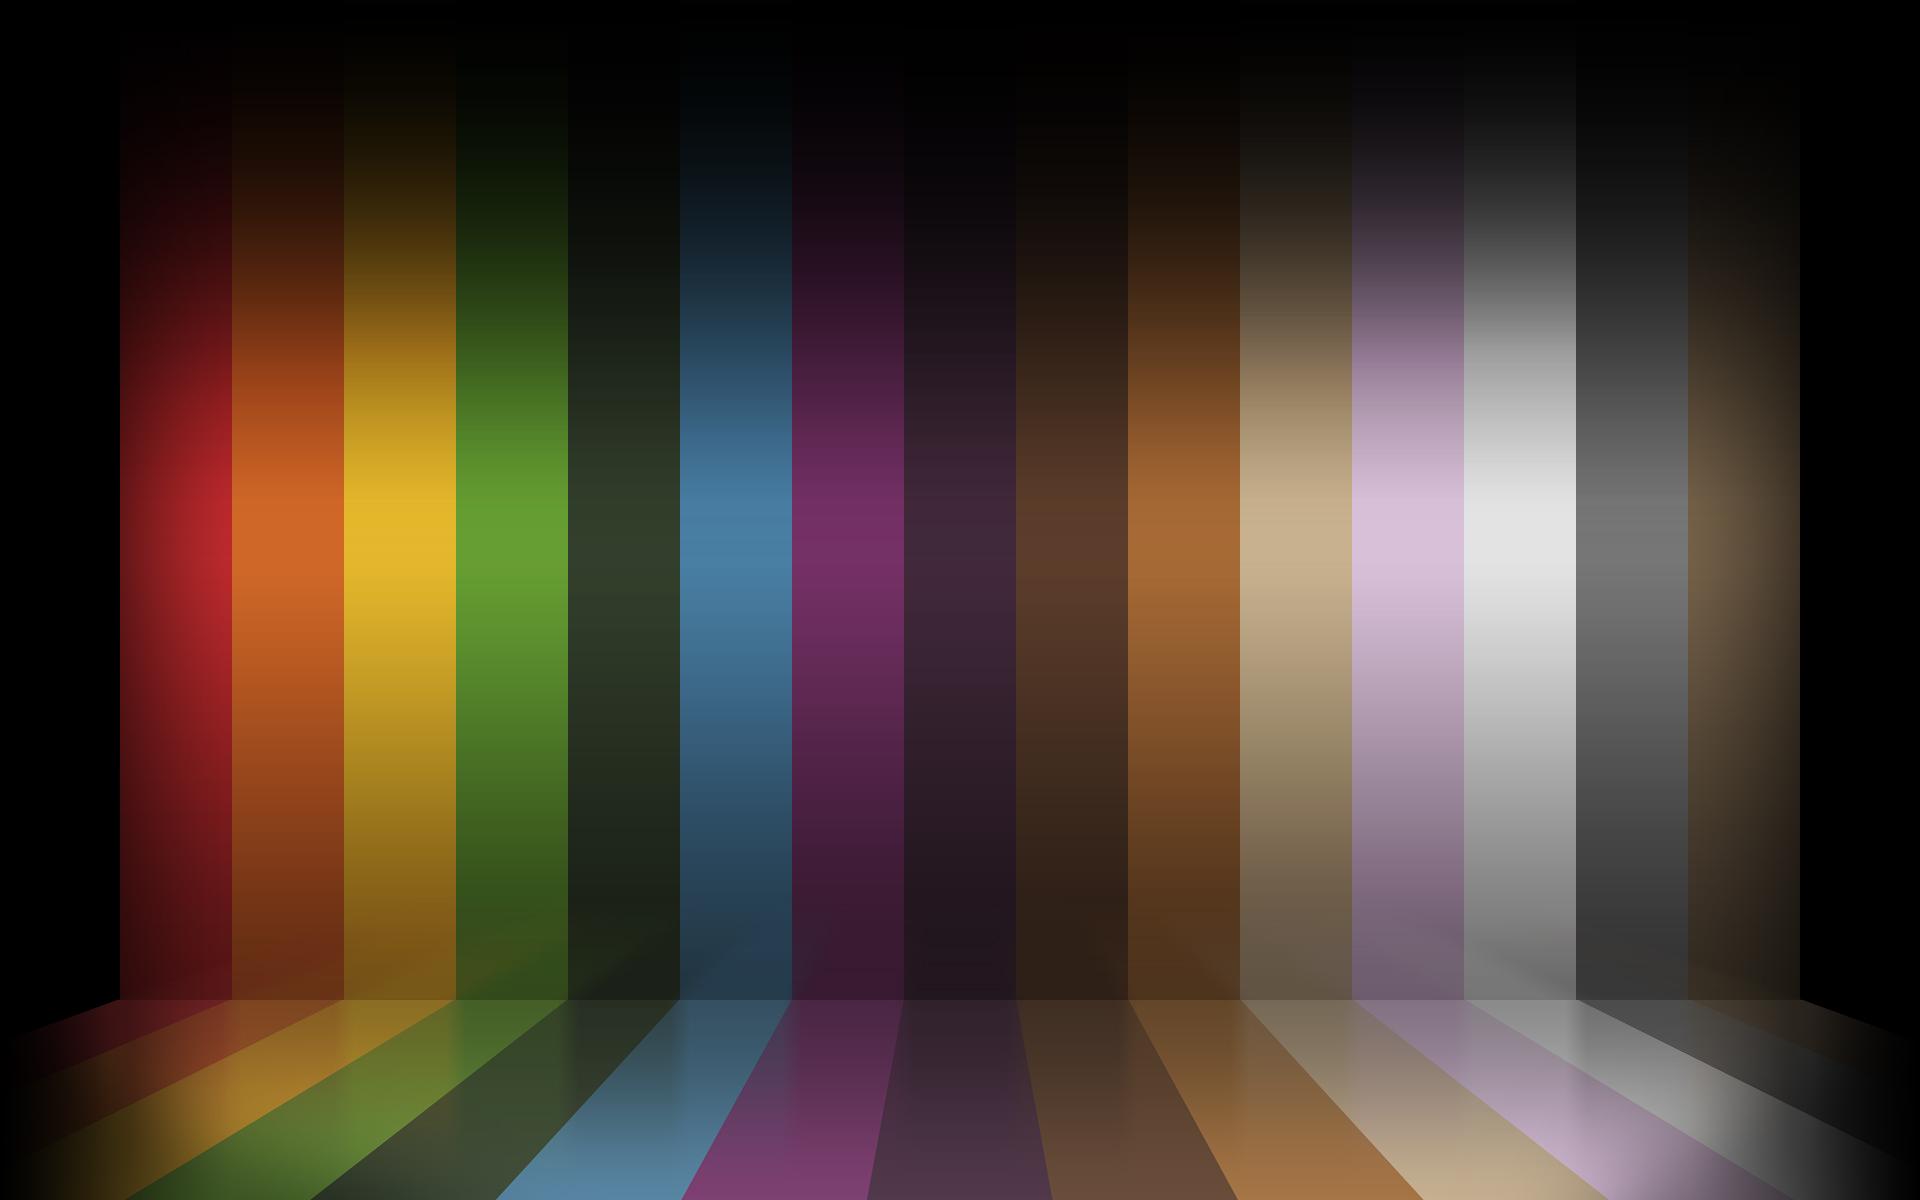 Color Burn HD Wallpaper Theme Bin Customization Wallpapers 1920x1200